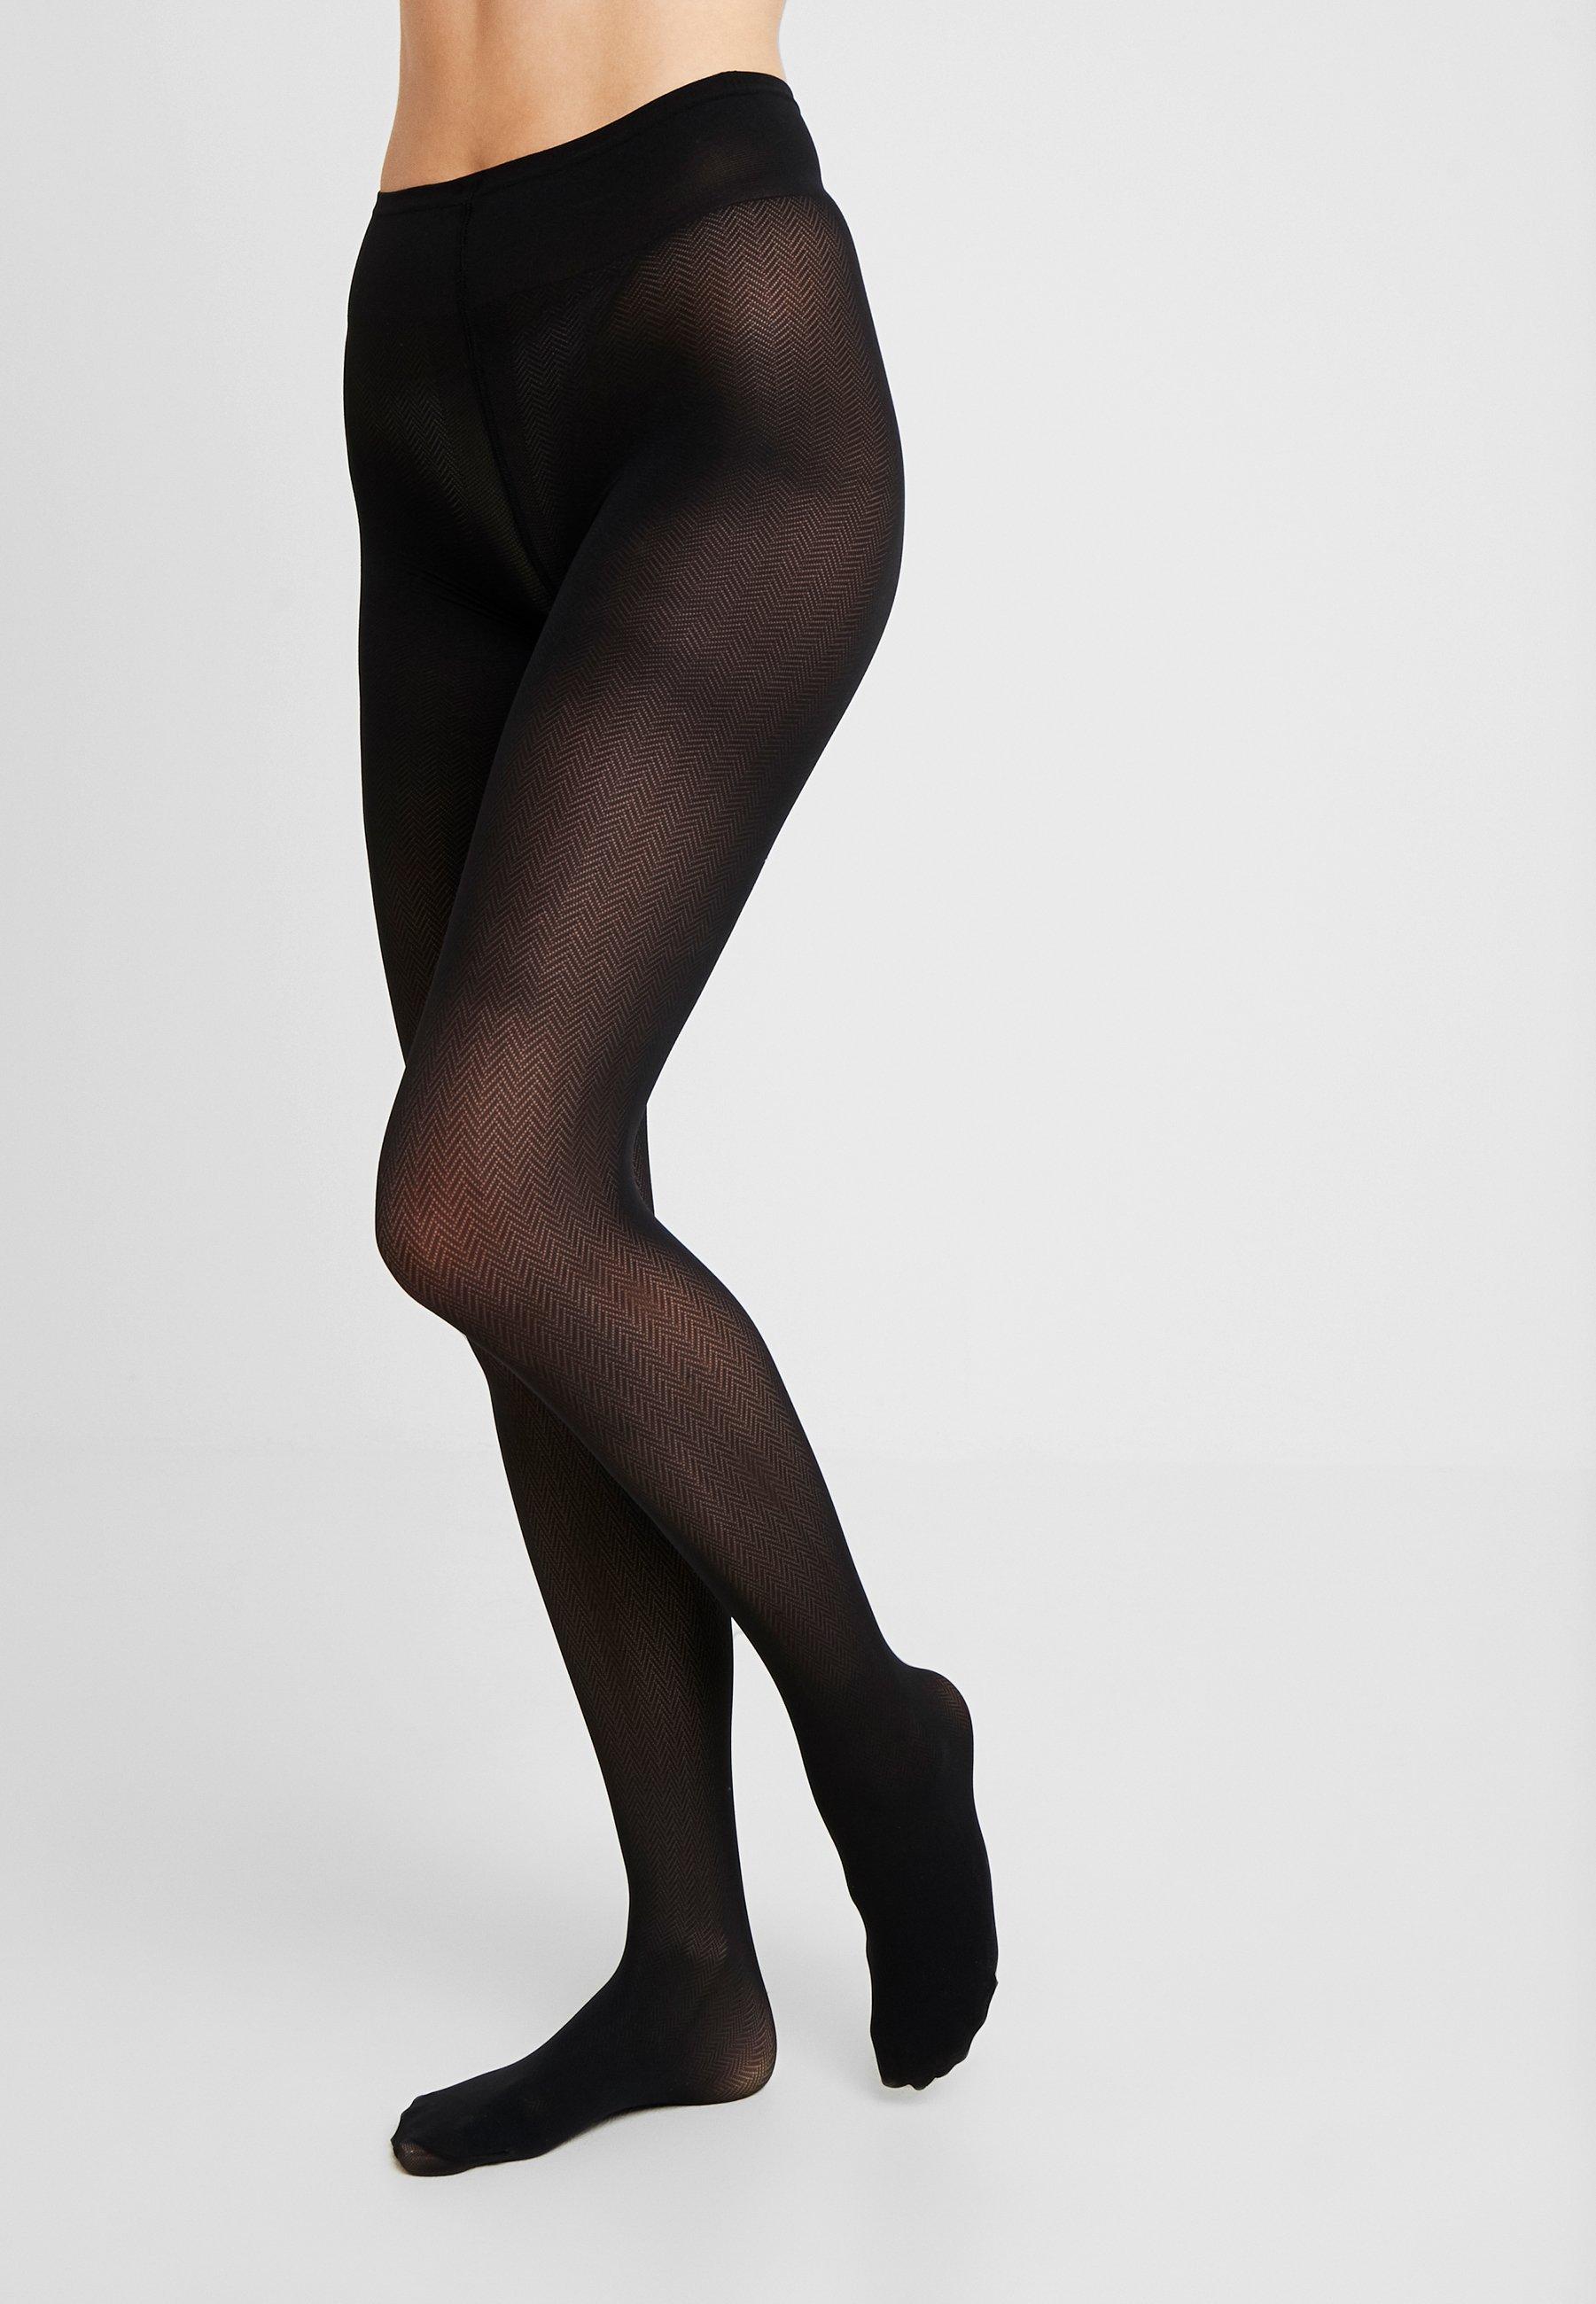 Femme NINA FISHBONE 40 DEN - Collants